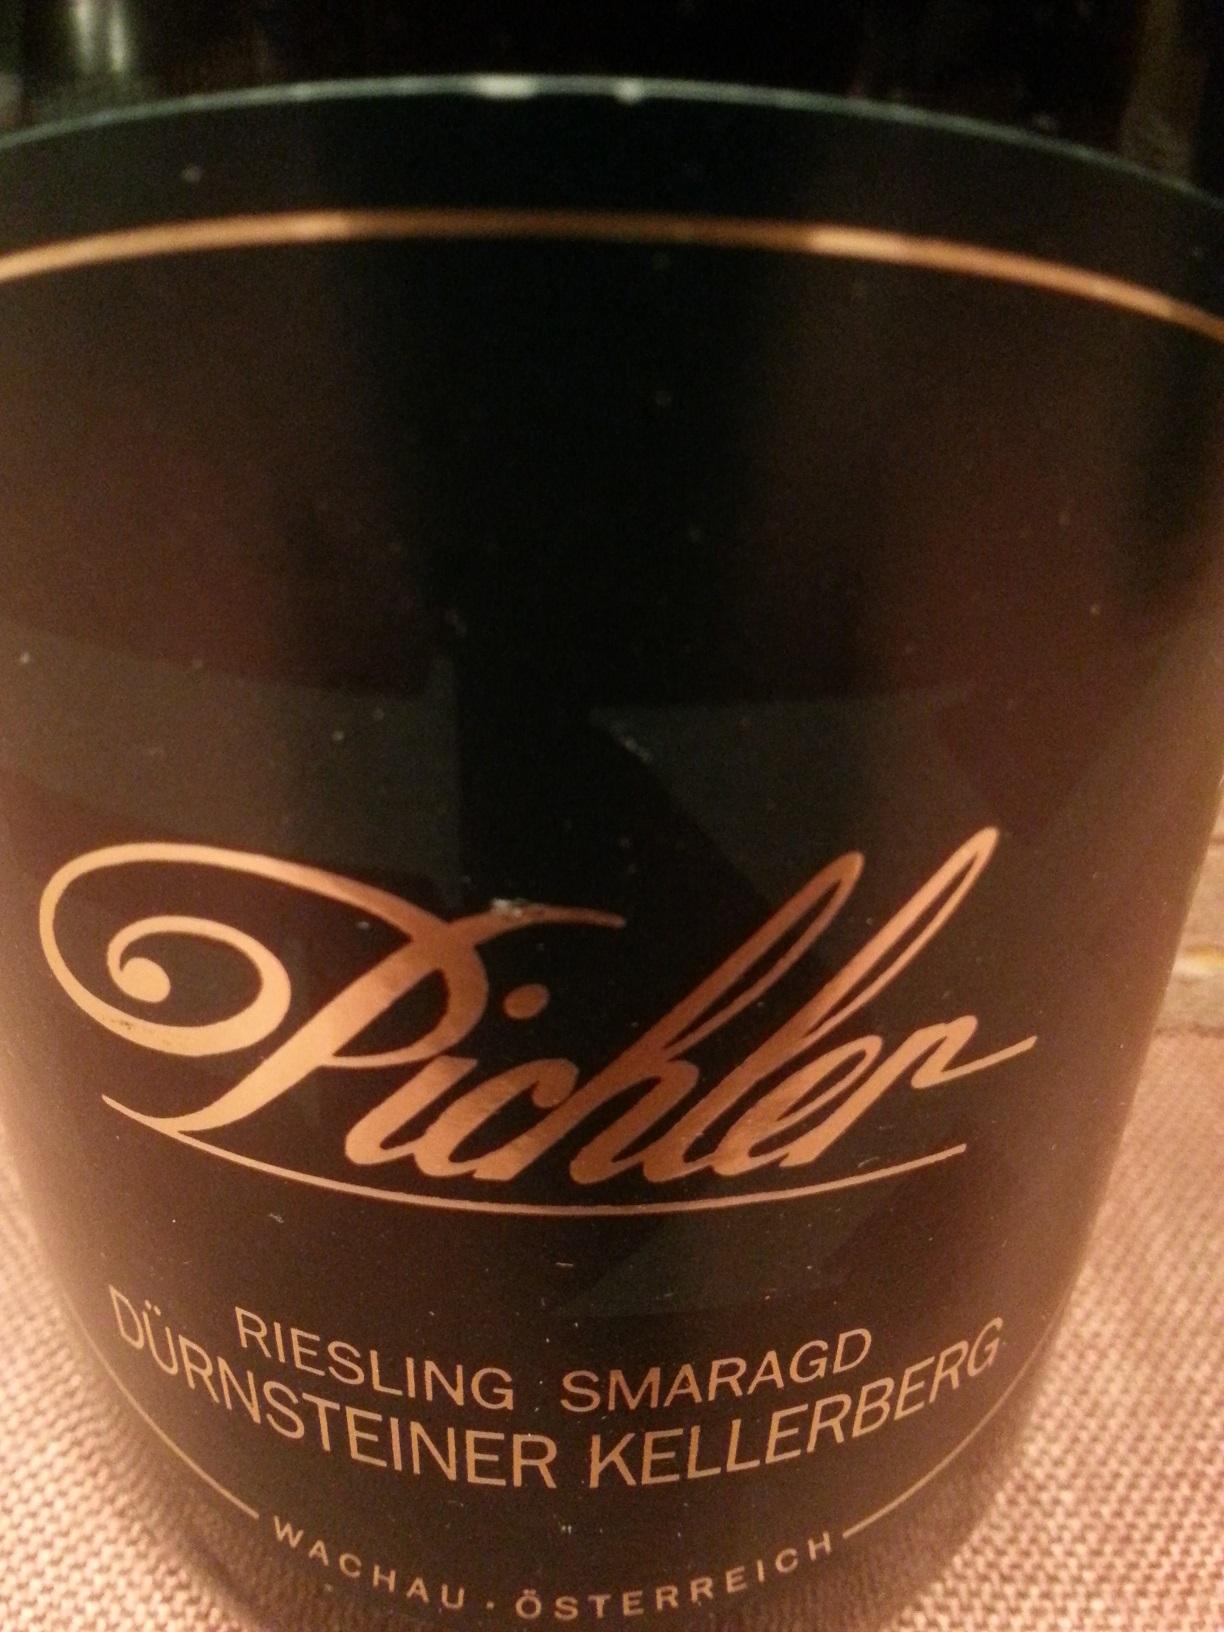 2007 Riesling Smaragd Kellerberg | F.X. Pichler